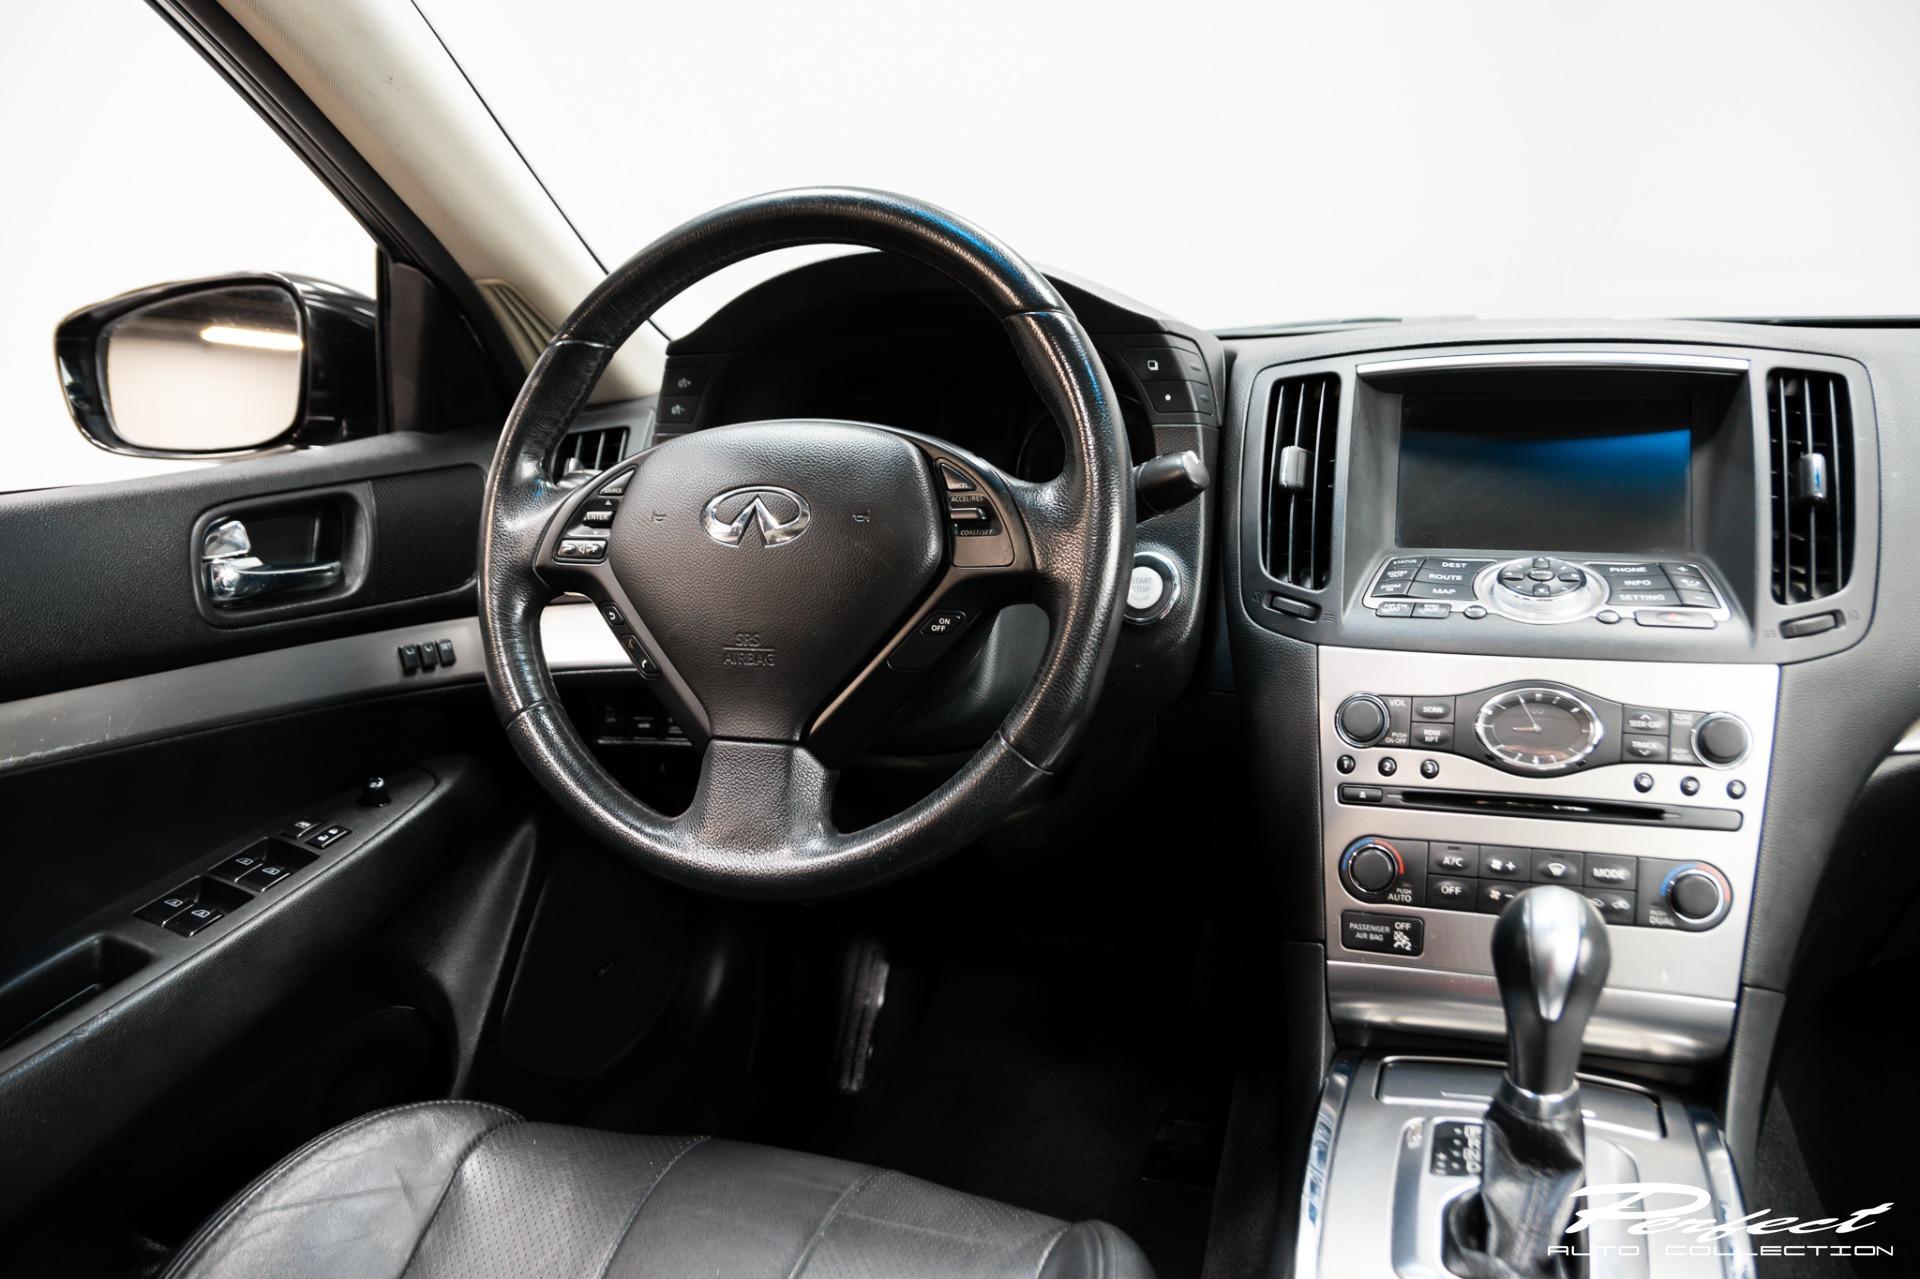 Used 2013 INFINITI G37 Sedan x